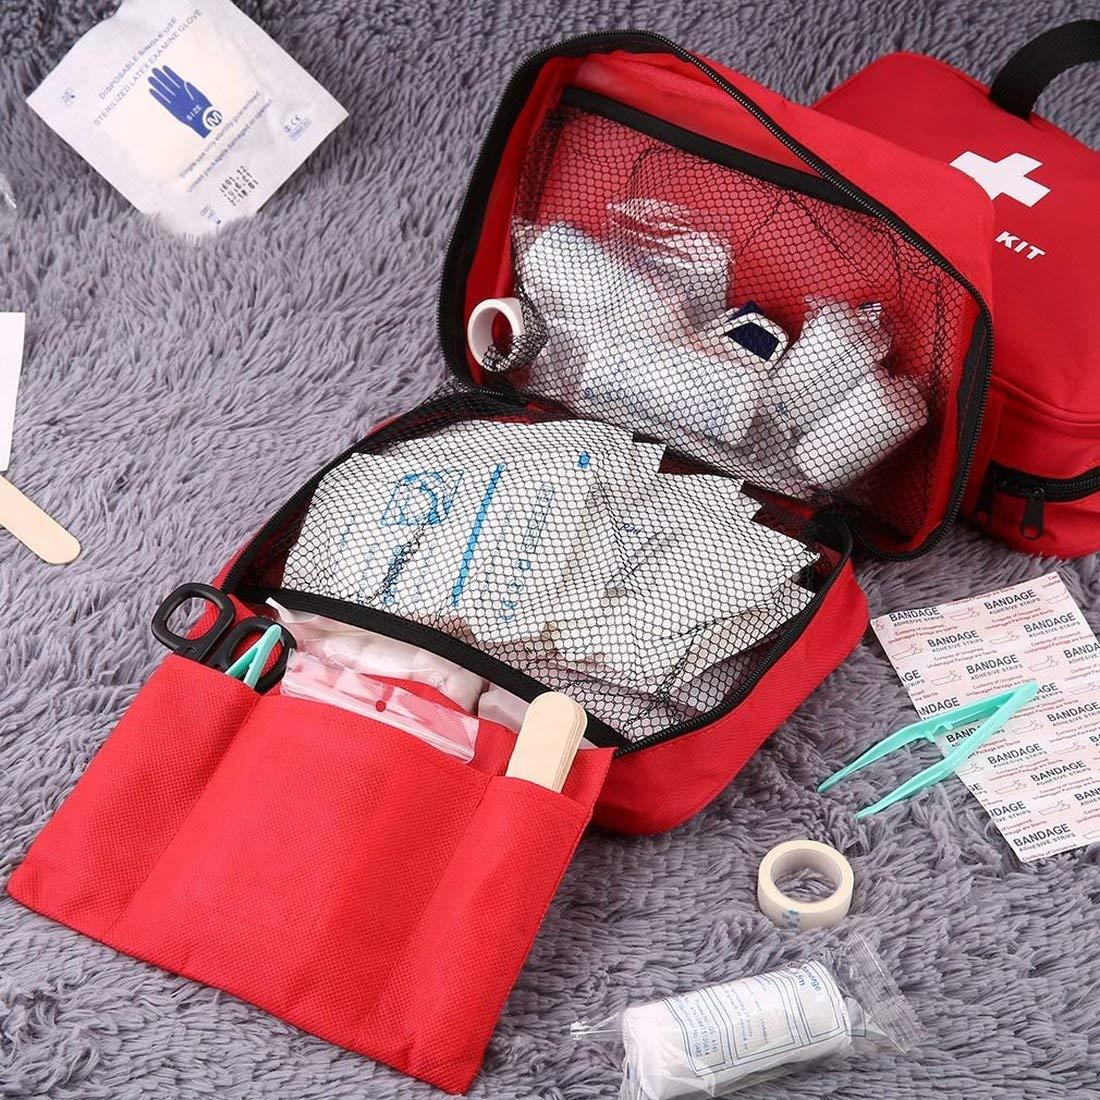 Formulaone Botiquí n de Primeros Auxilios al Aire Libre Inicio Kit de Emergencia mé dica Bolsillo vací o de Supervivencia Bolsa de Mano mé dica Multifuncional para Acampar Viajes